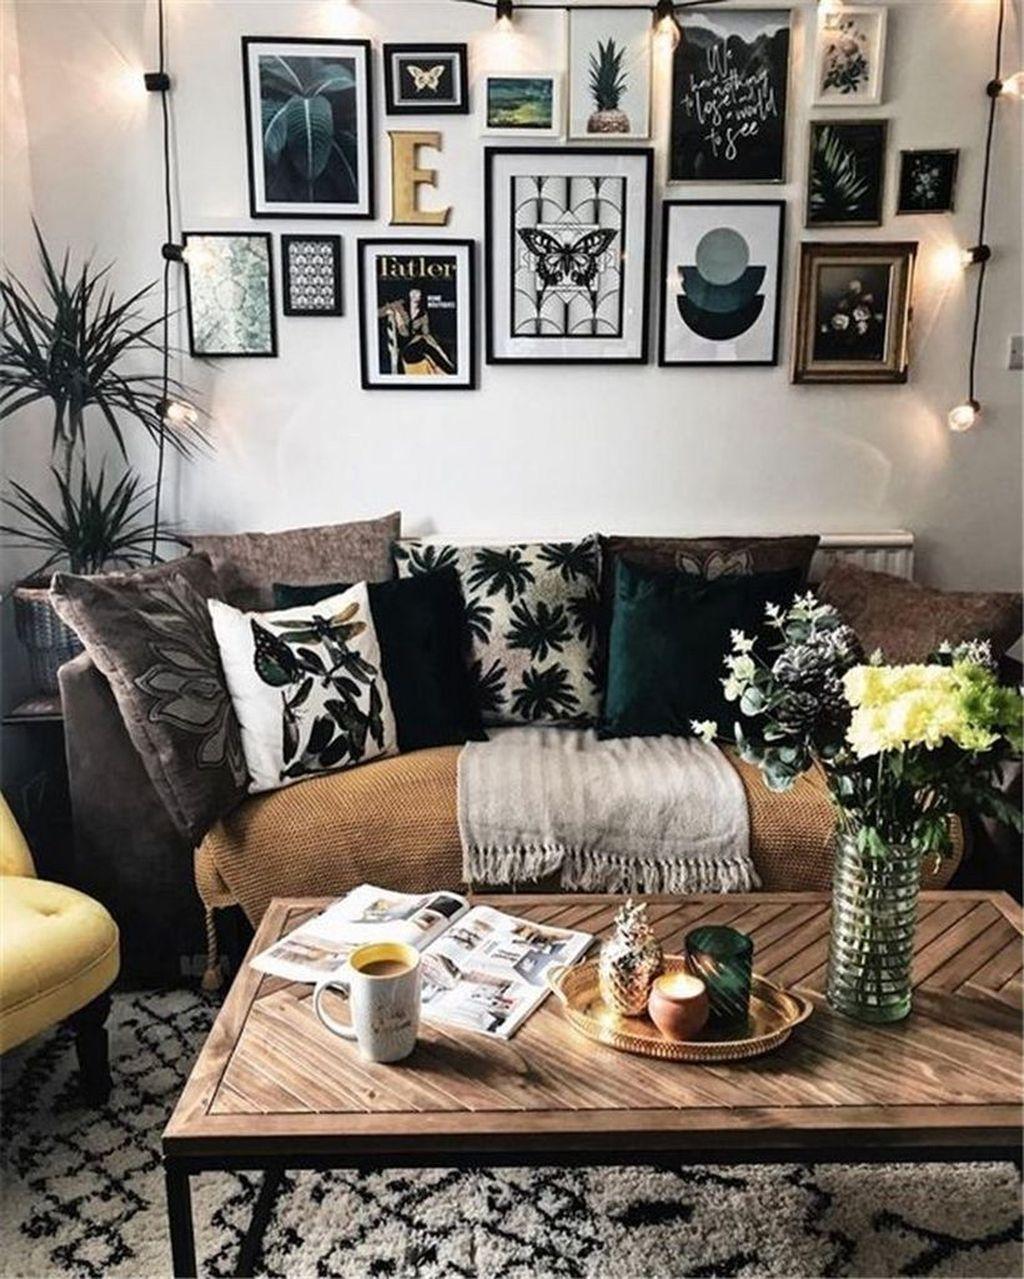 34 The Best Rustic Bohemian Living Room Decor Ideas Homyhomee In 2020 Living Room Decor Modern Bohemian Living Room Decor Living Room Decor Cozy